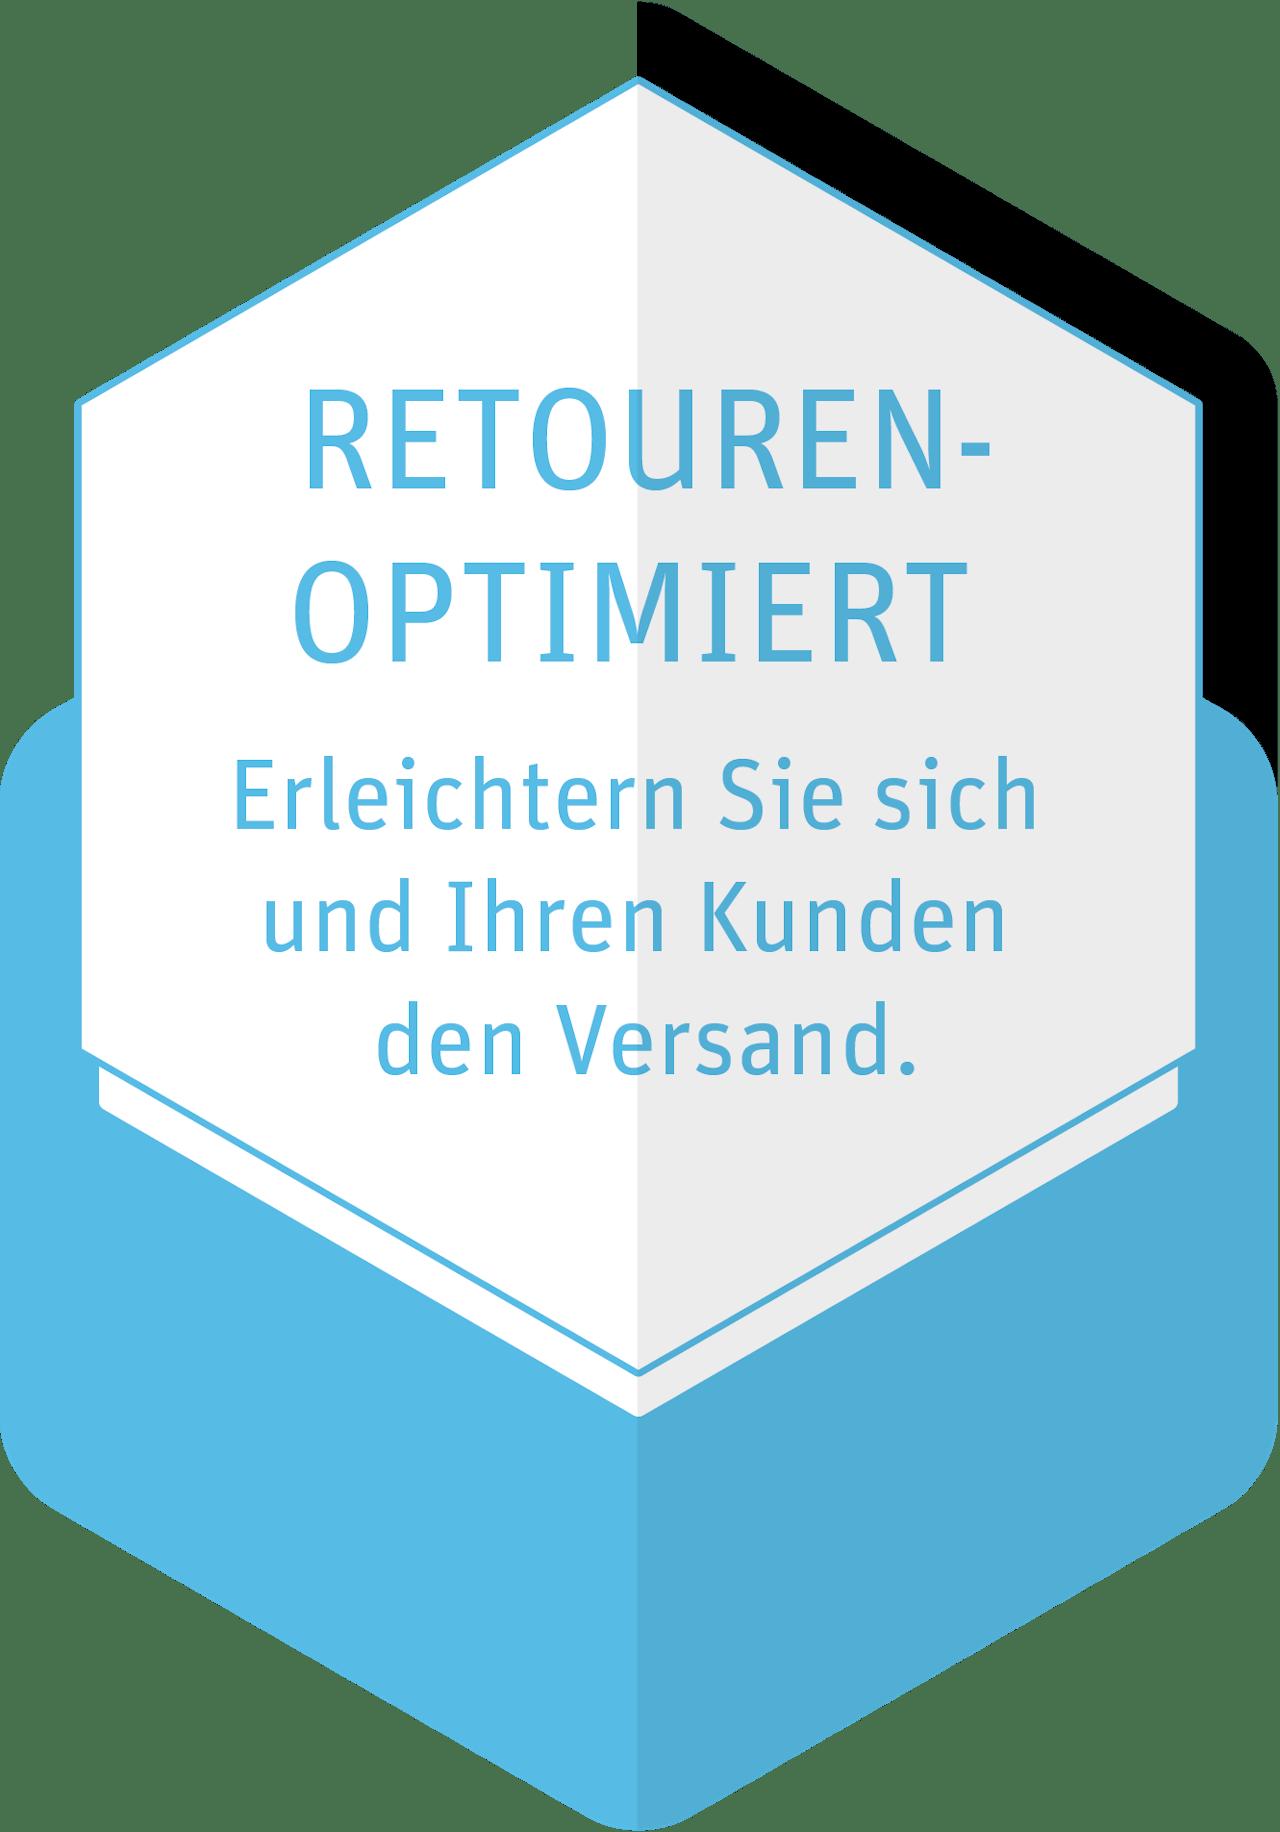 retouren optimiert